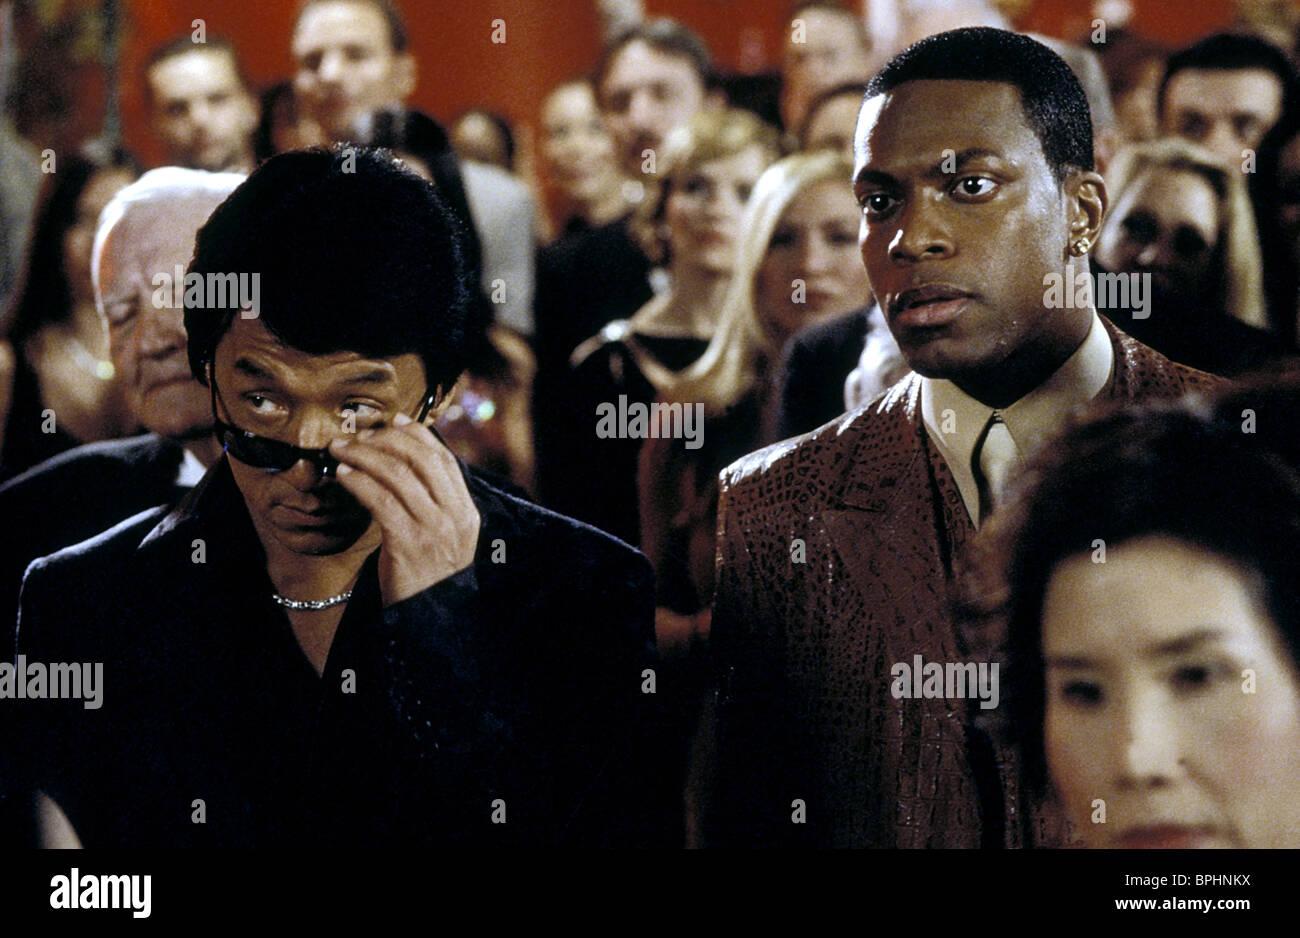 Jackie Chan And Chris Tucker Rush Hour 2 Jackie chan & chris tucker rush hour 2 (2001) stock photo